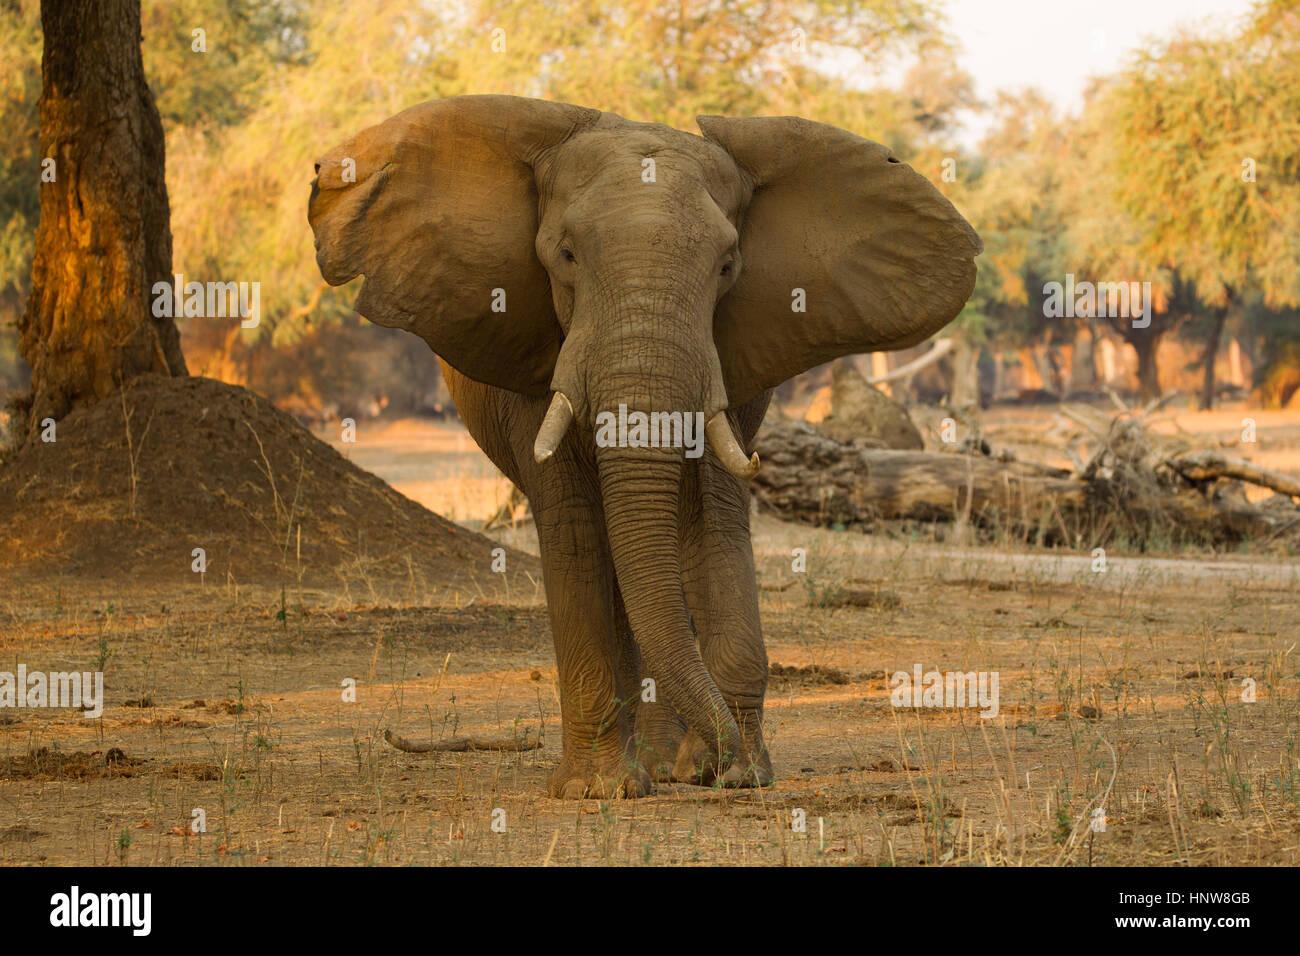 Portrait of bull elephant (Loxodonta africana) with a bullet hole in forehead, Mana Pools National Park, Zimbabwe - Stock Image